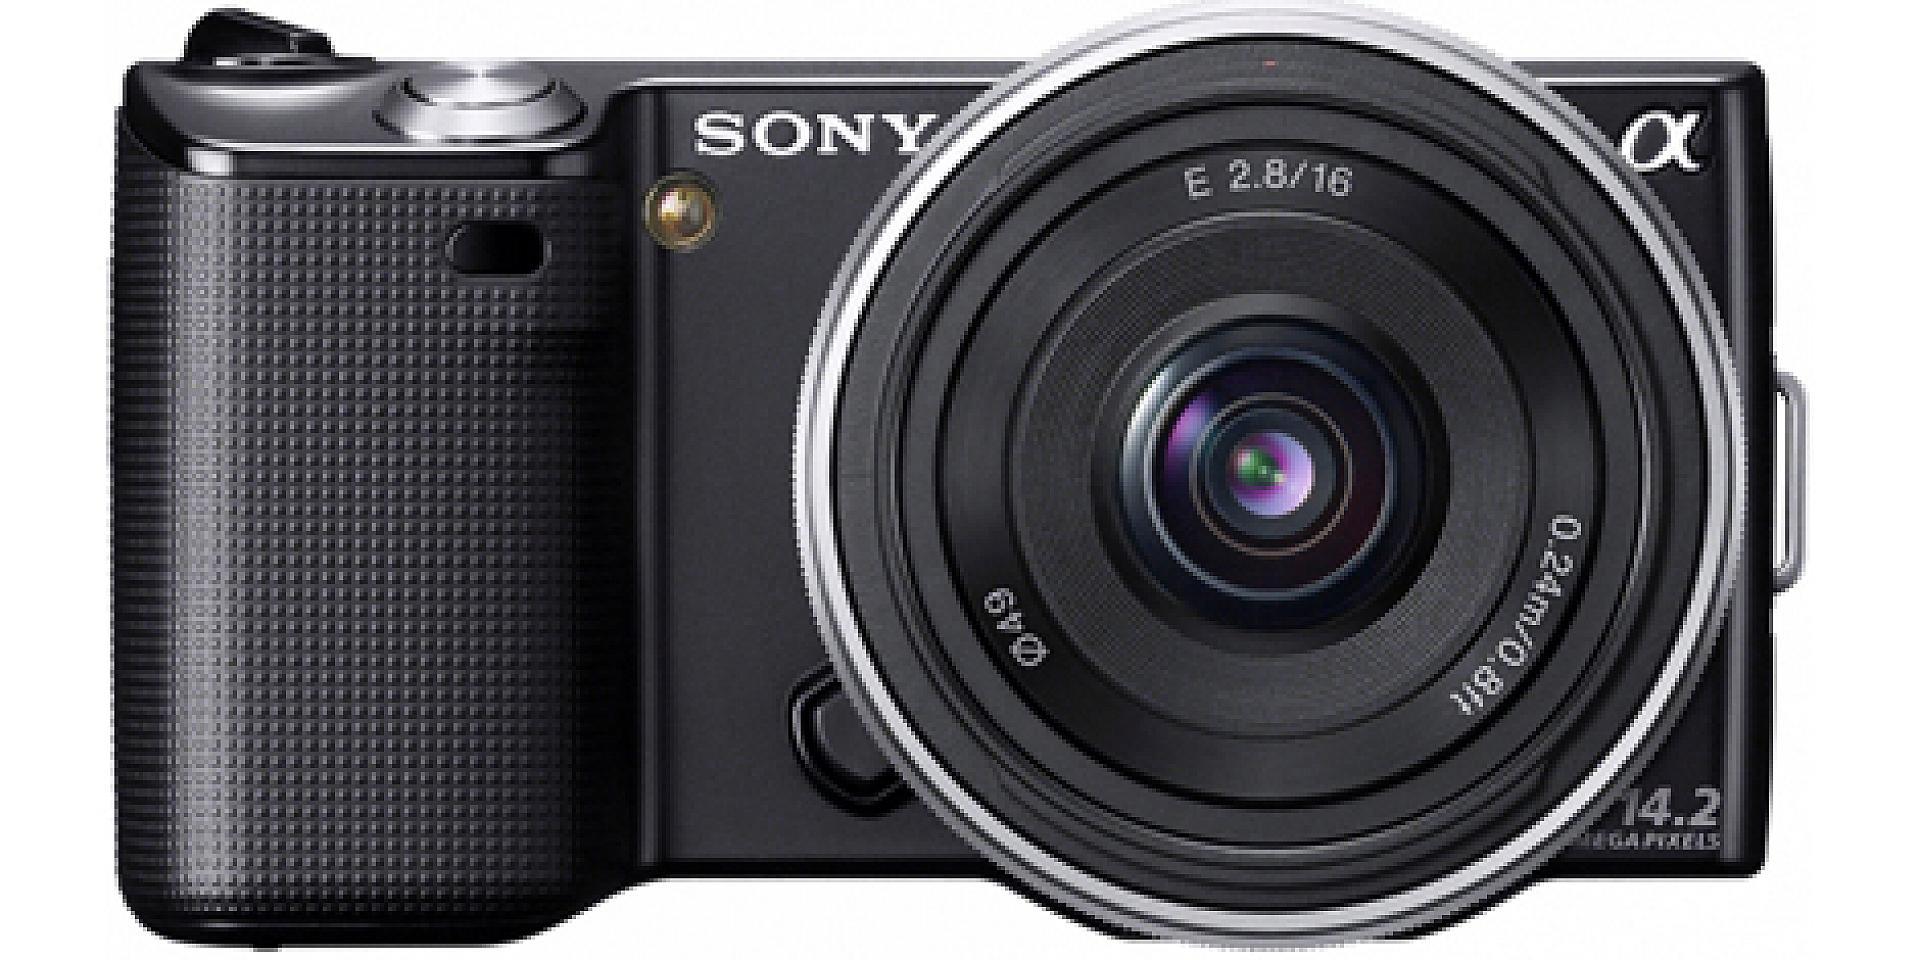 21 digitalkameror i stort test